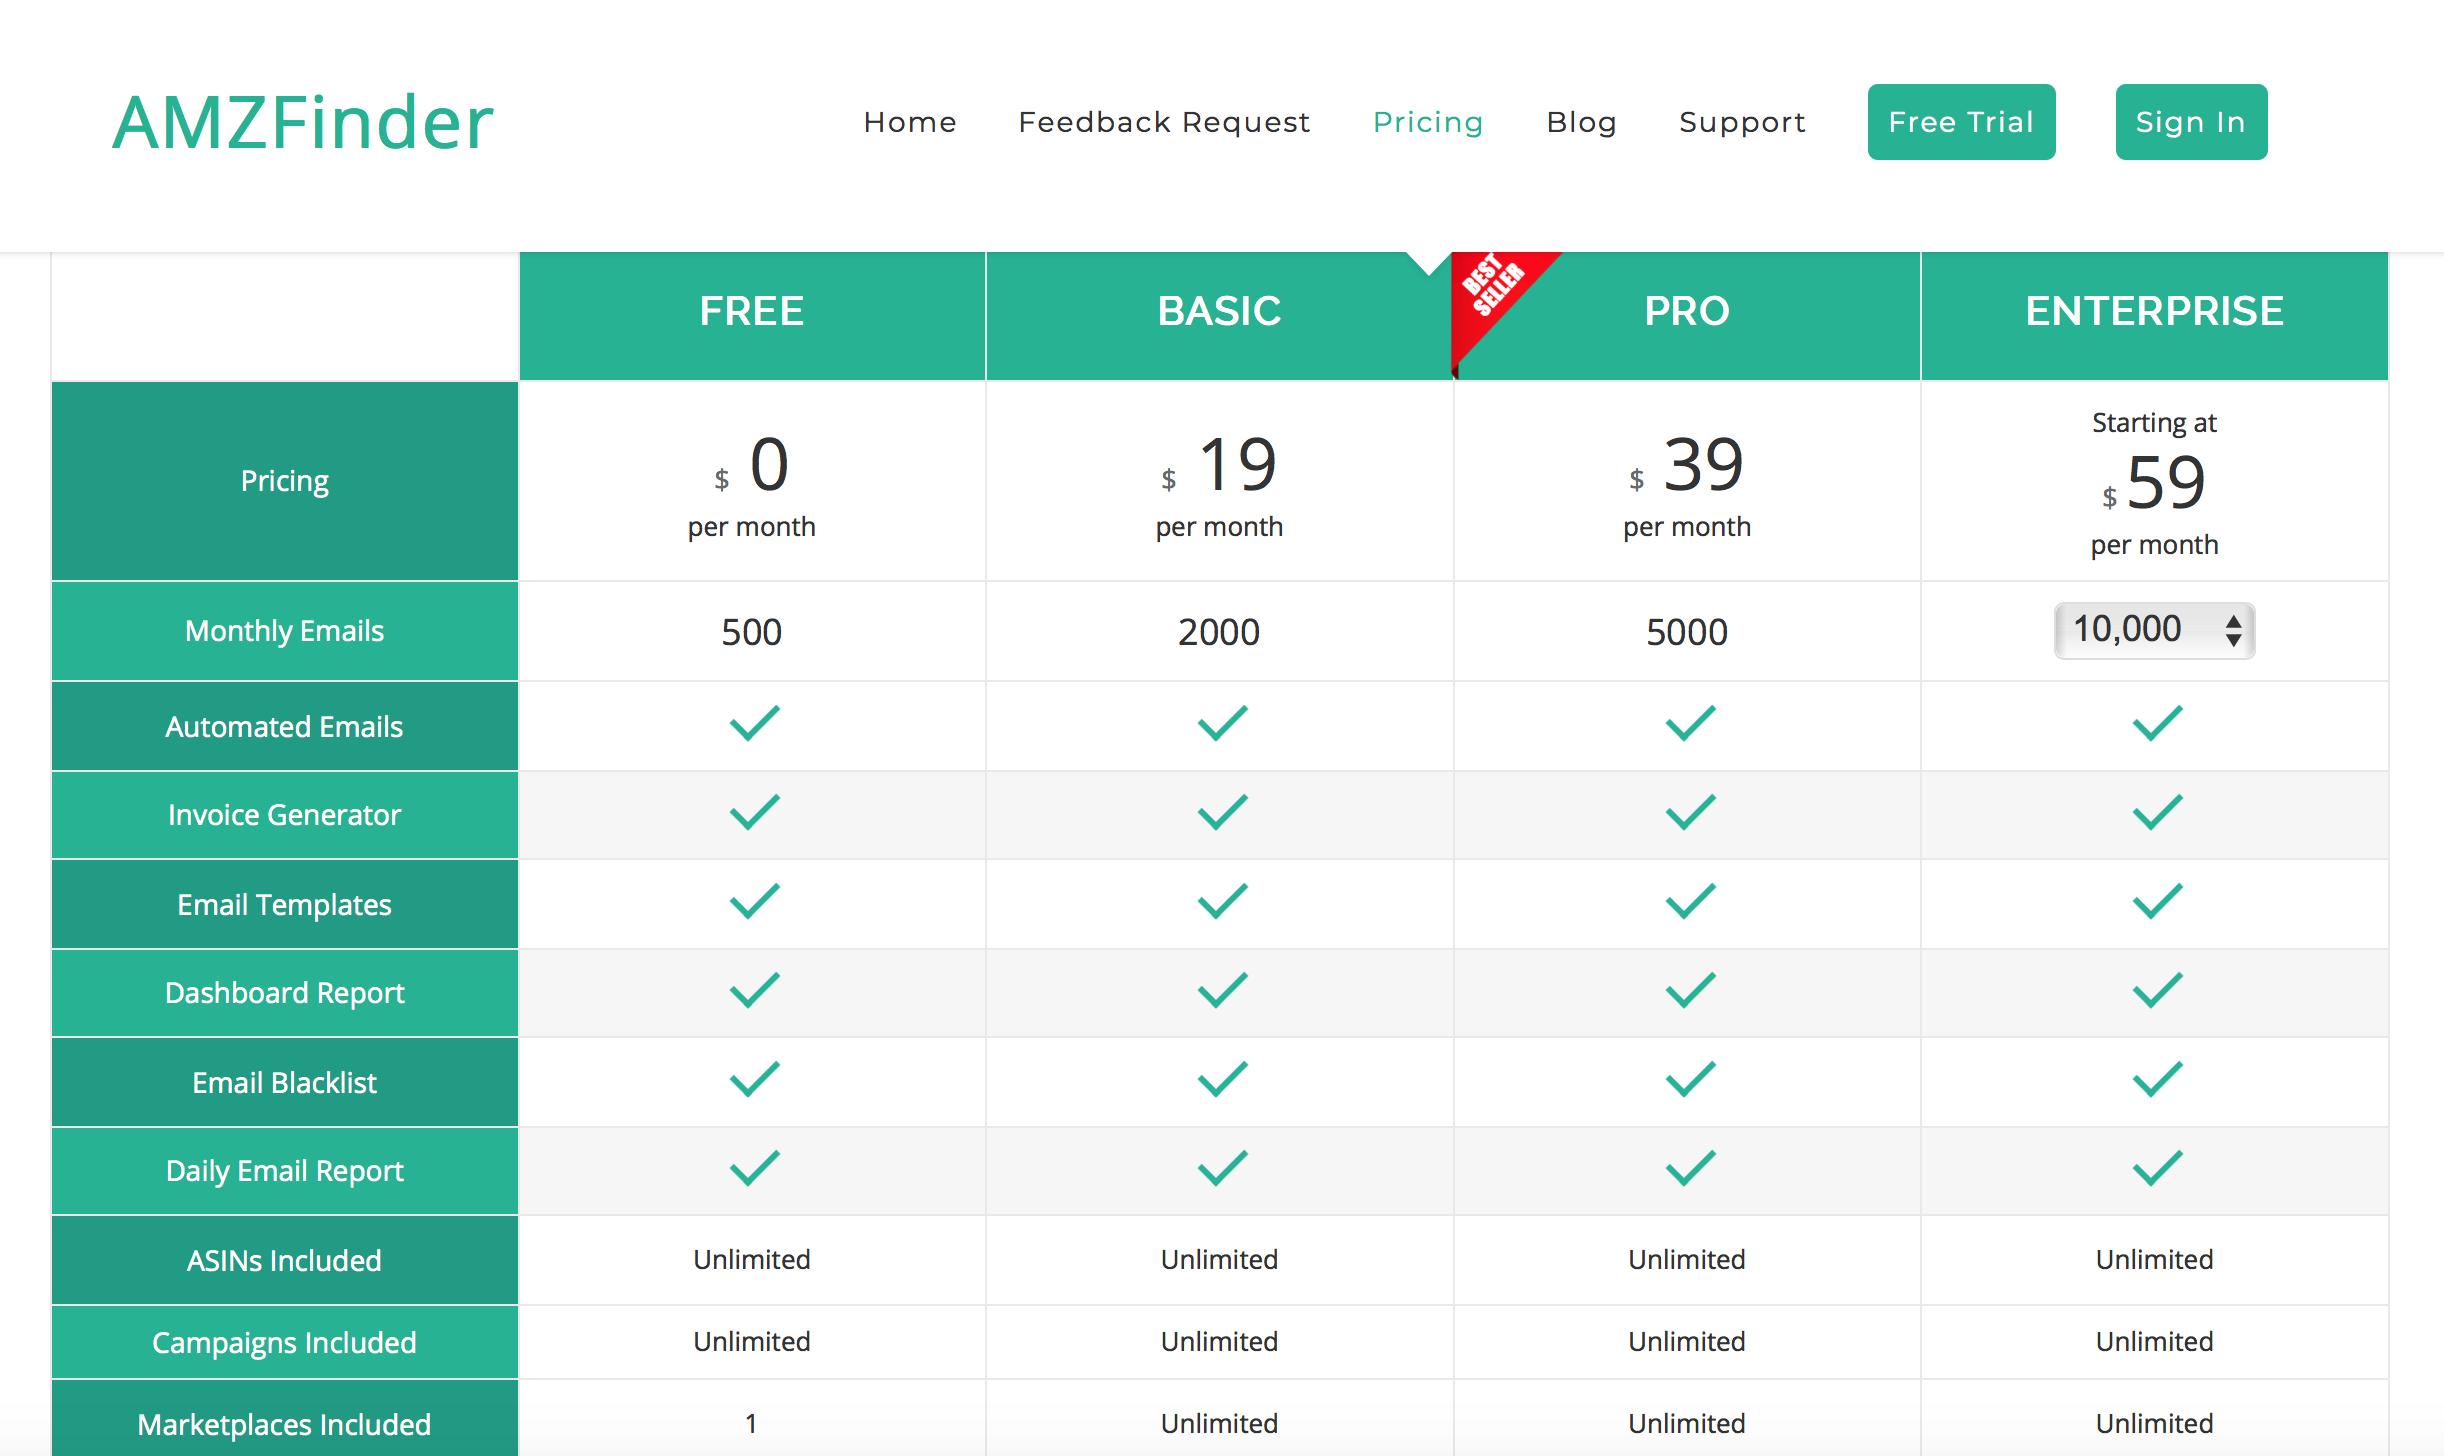 Amazon feedback tools: AMZFinder pricing grid